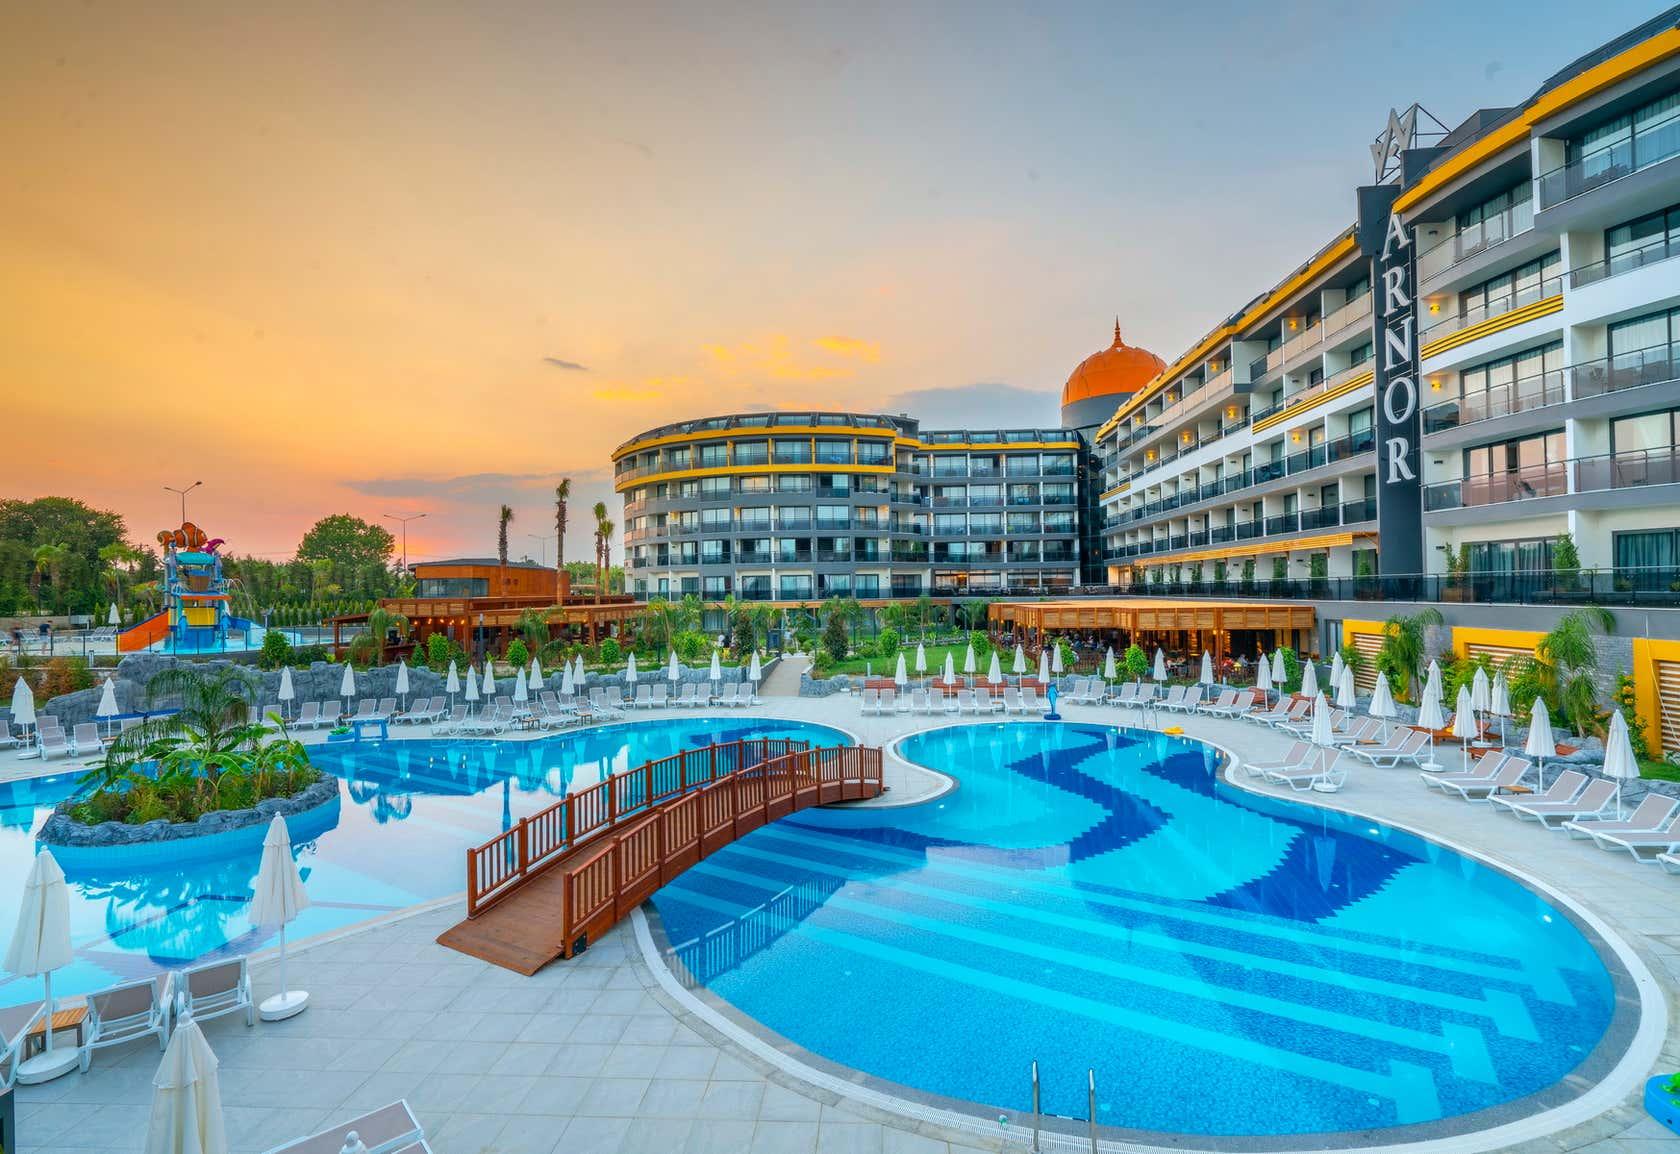 Arnor De Luxe Hotel And Spa